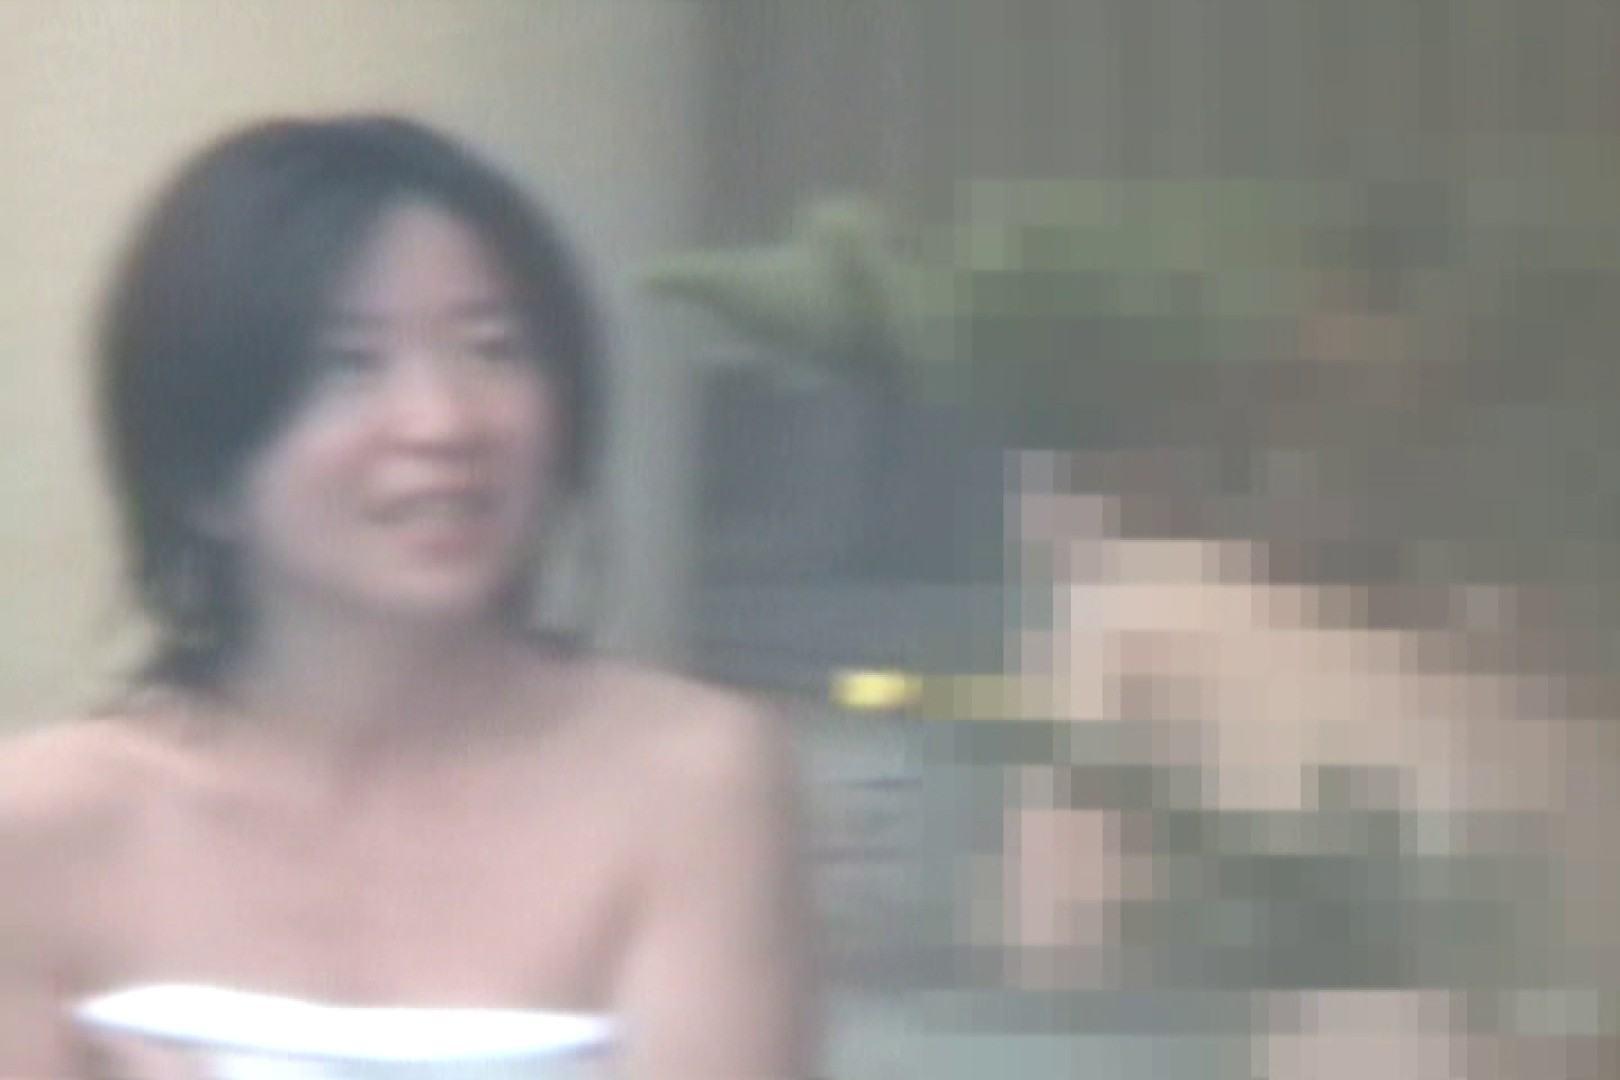 Aquaな露天風呂Vol.841 エッチな盗撮 ぱこり動画紹介 86pic 10